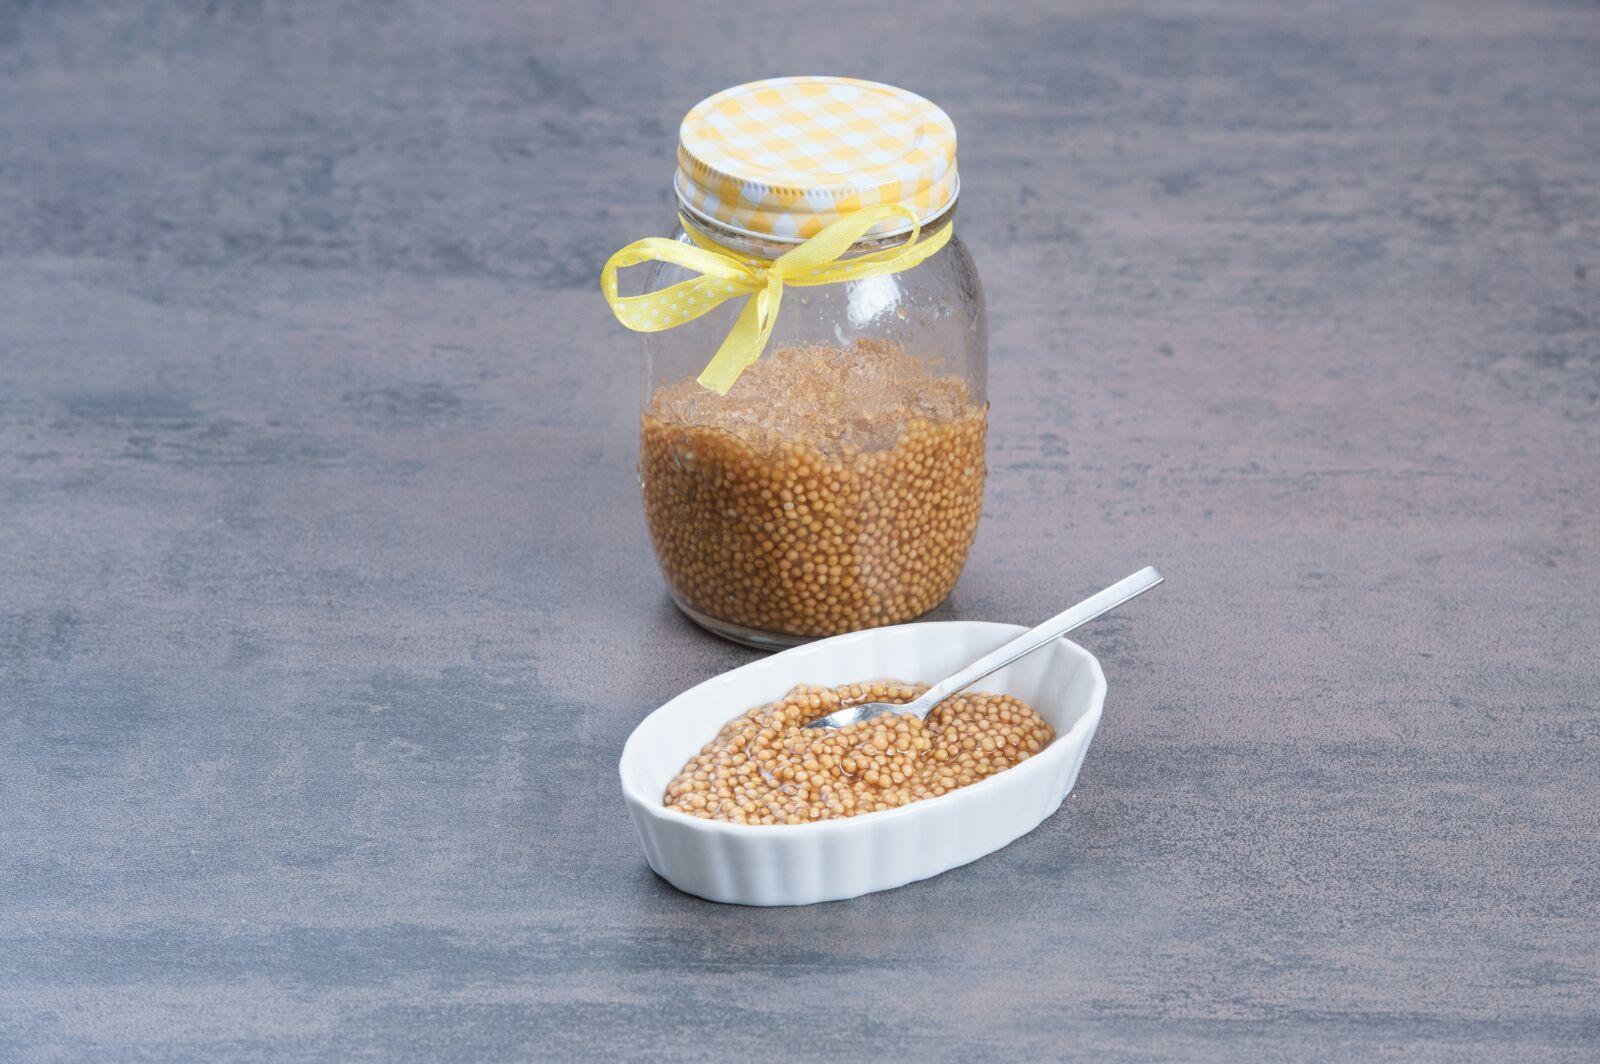 Goldgelber Senfkaviar